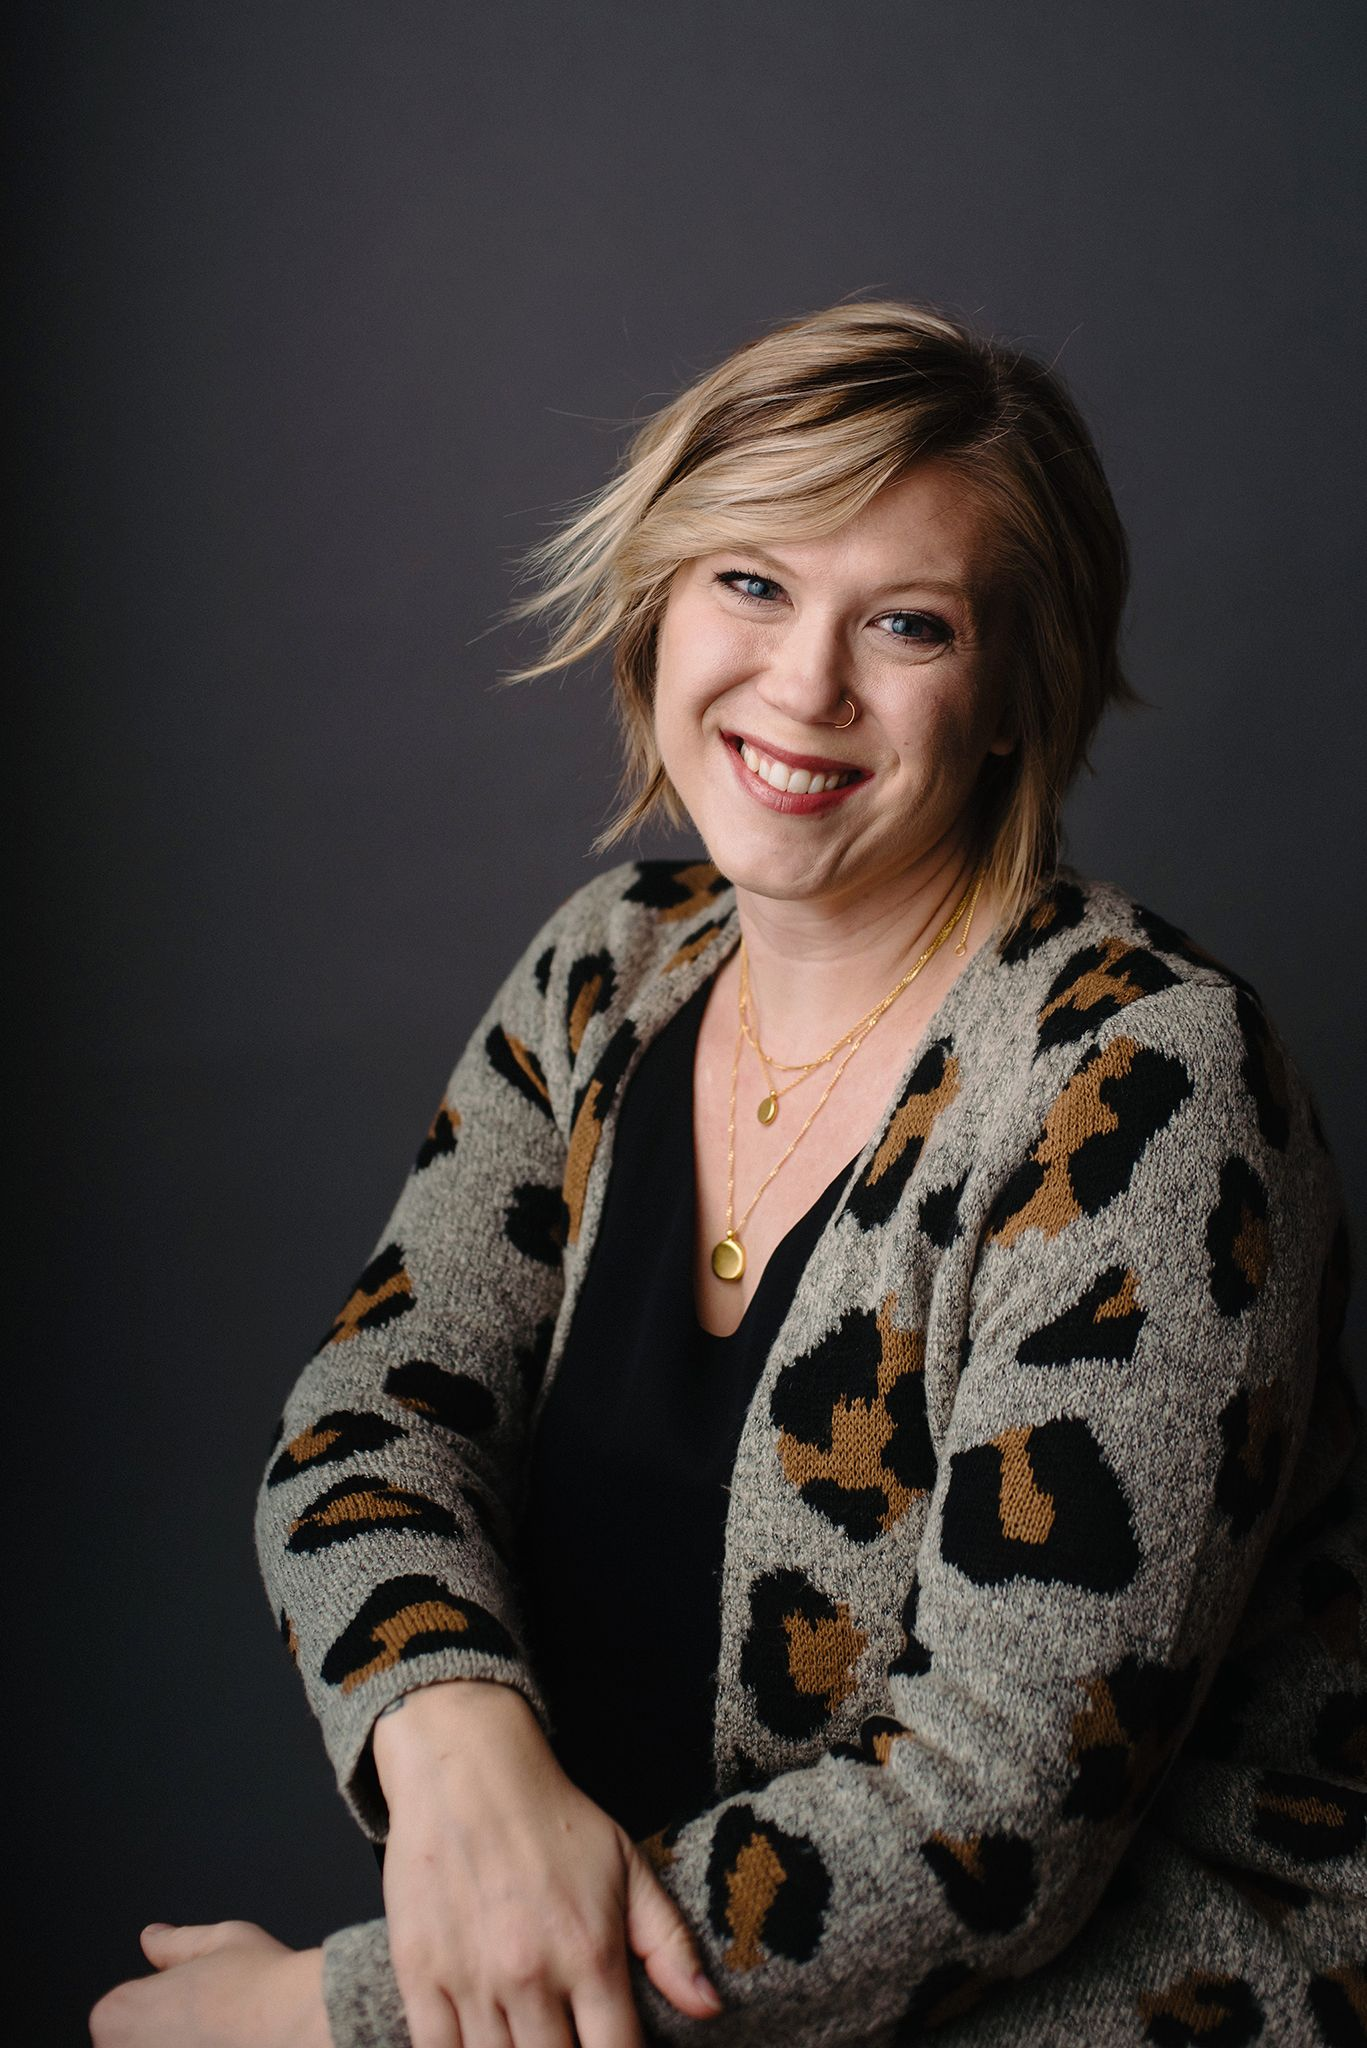 McKenzie Ring, Storyteller | Digital Marketing